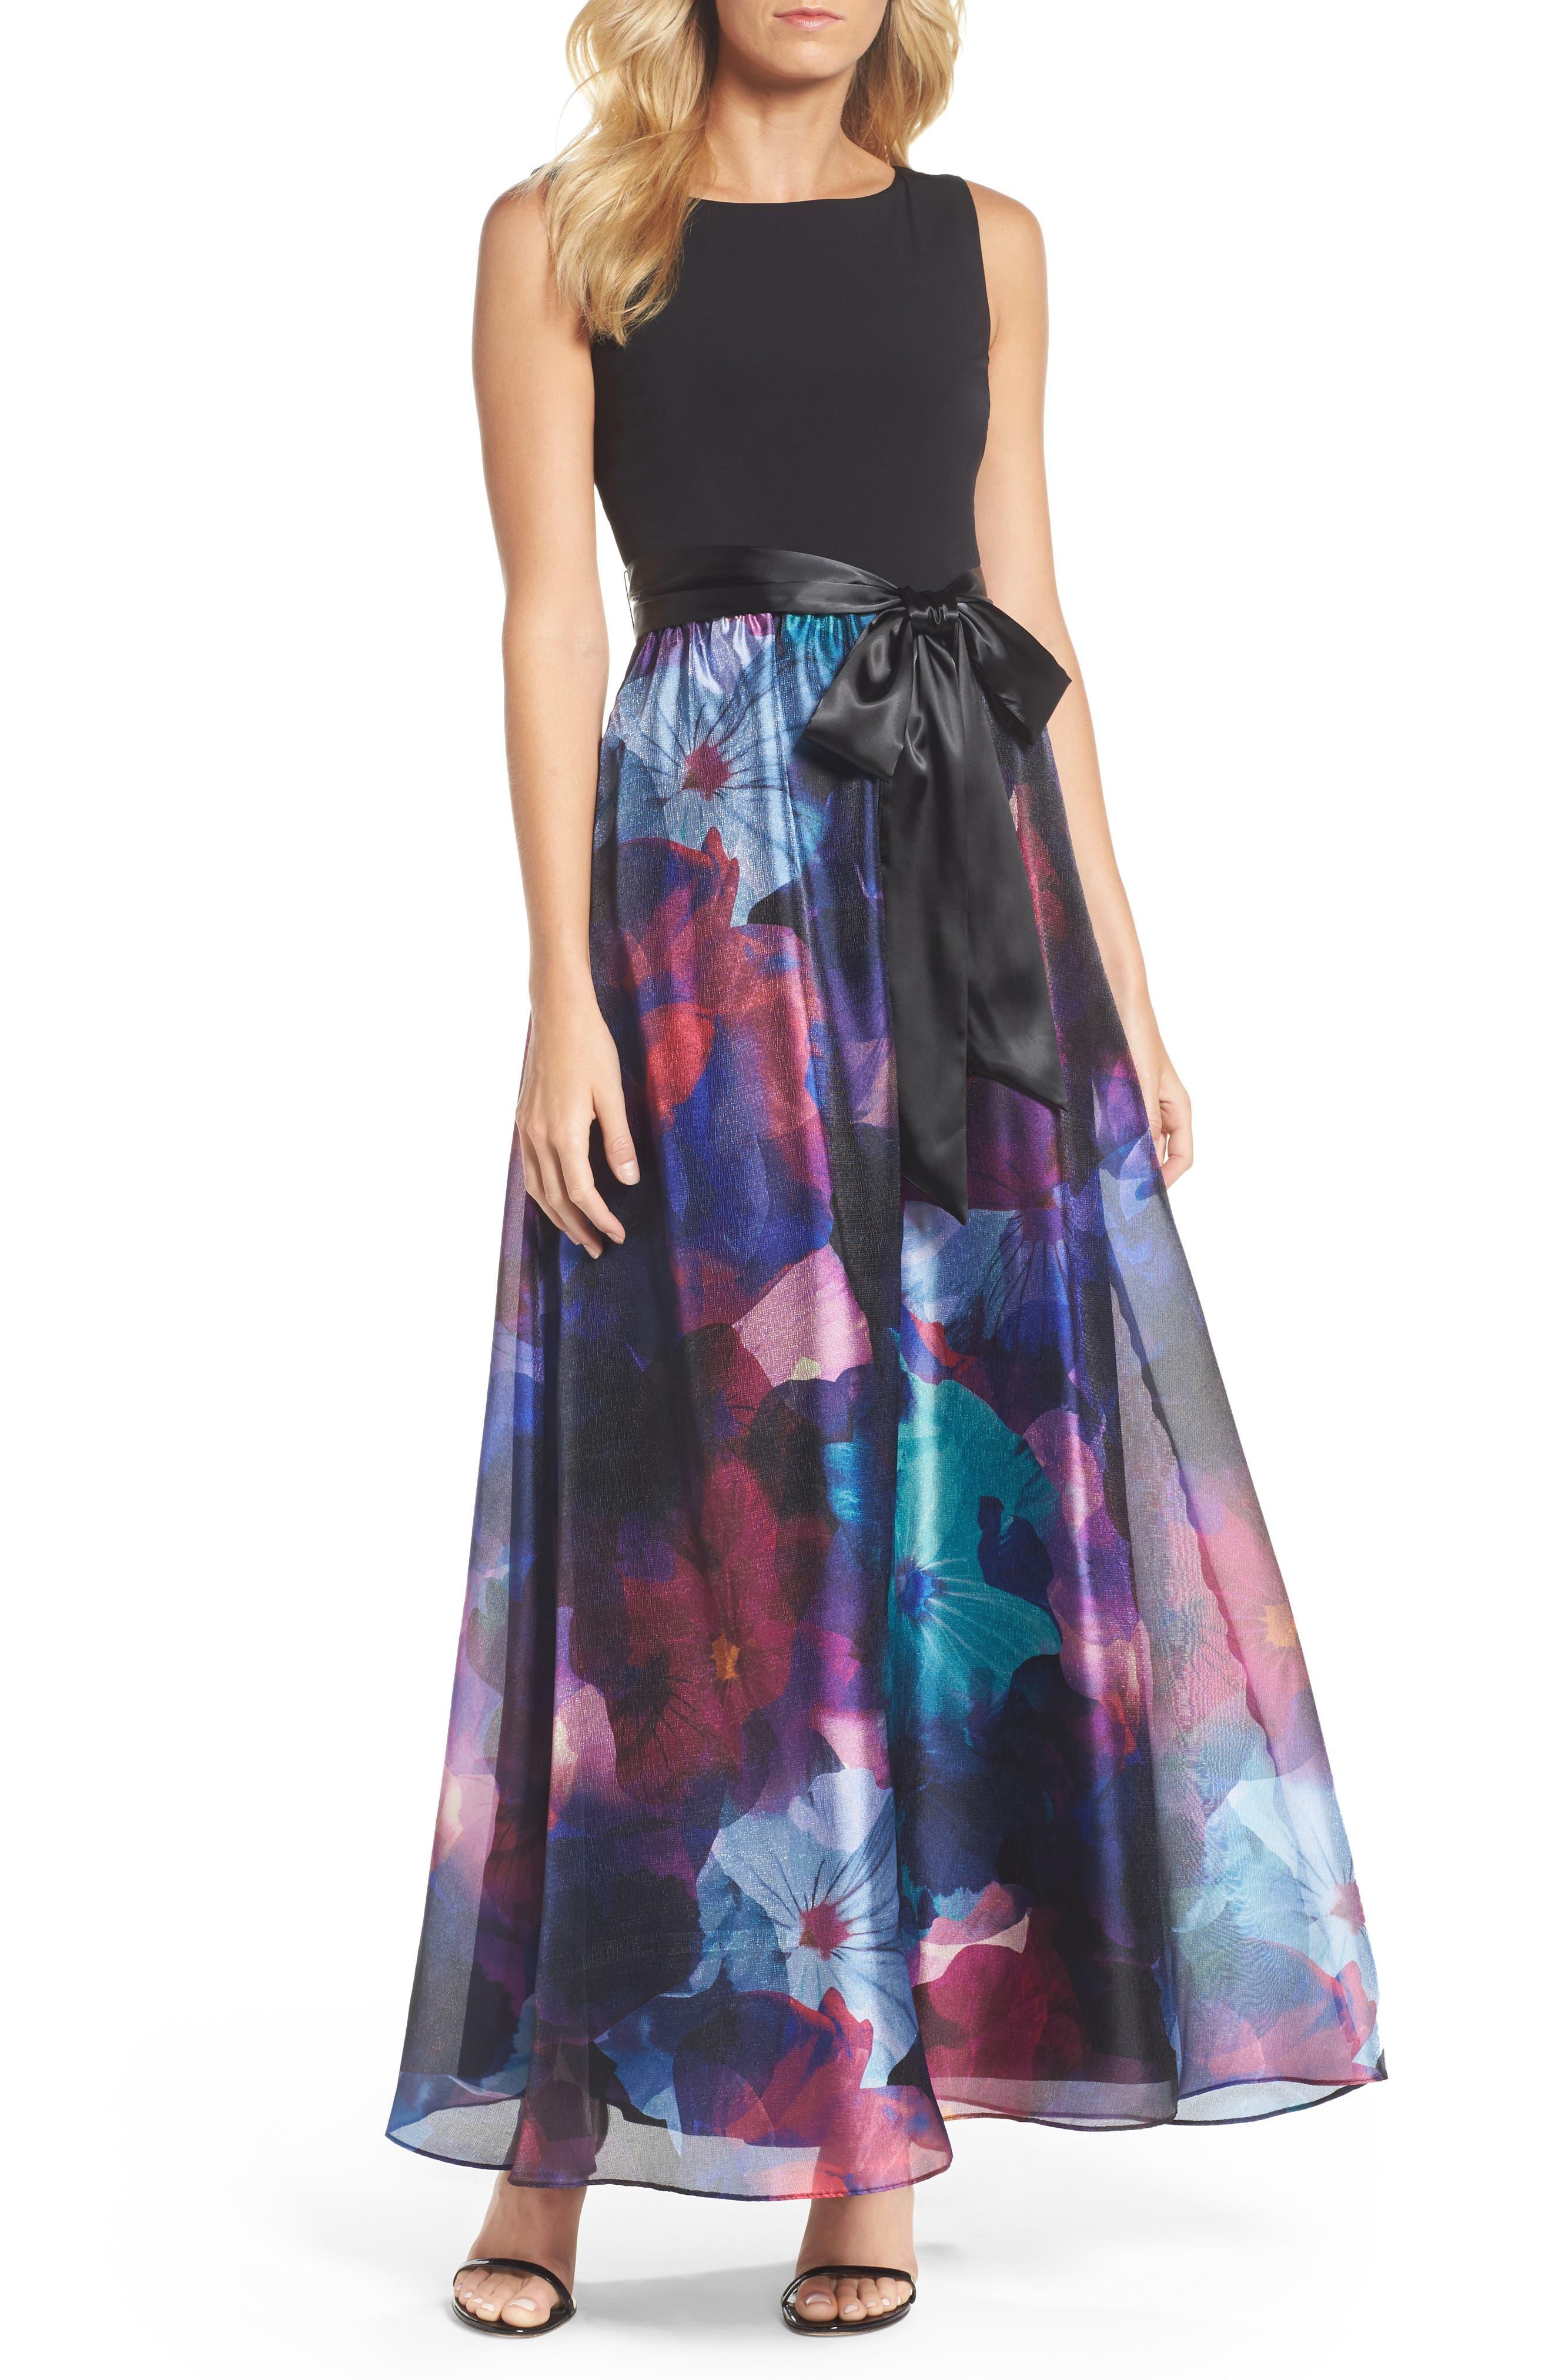 Floral Splash Mixed Media Maxi Dress,                             Main thumbnail 1, color,                             002